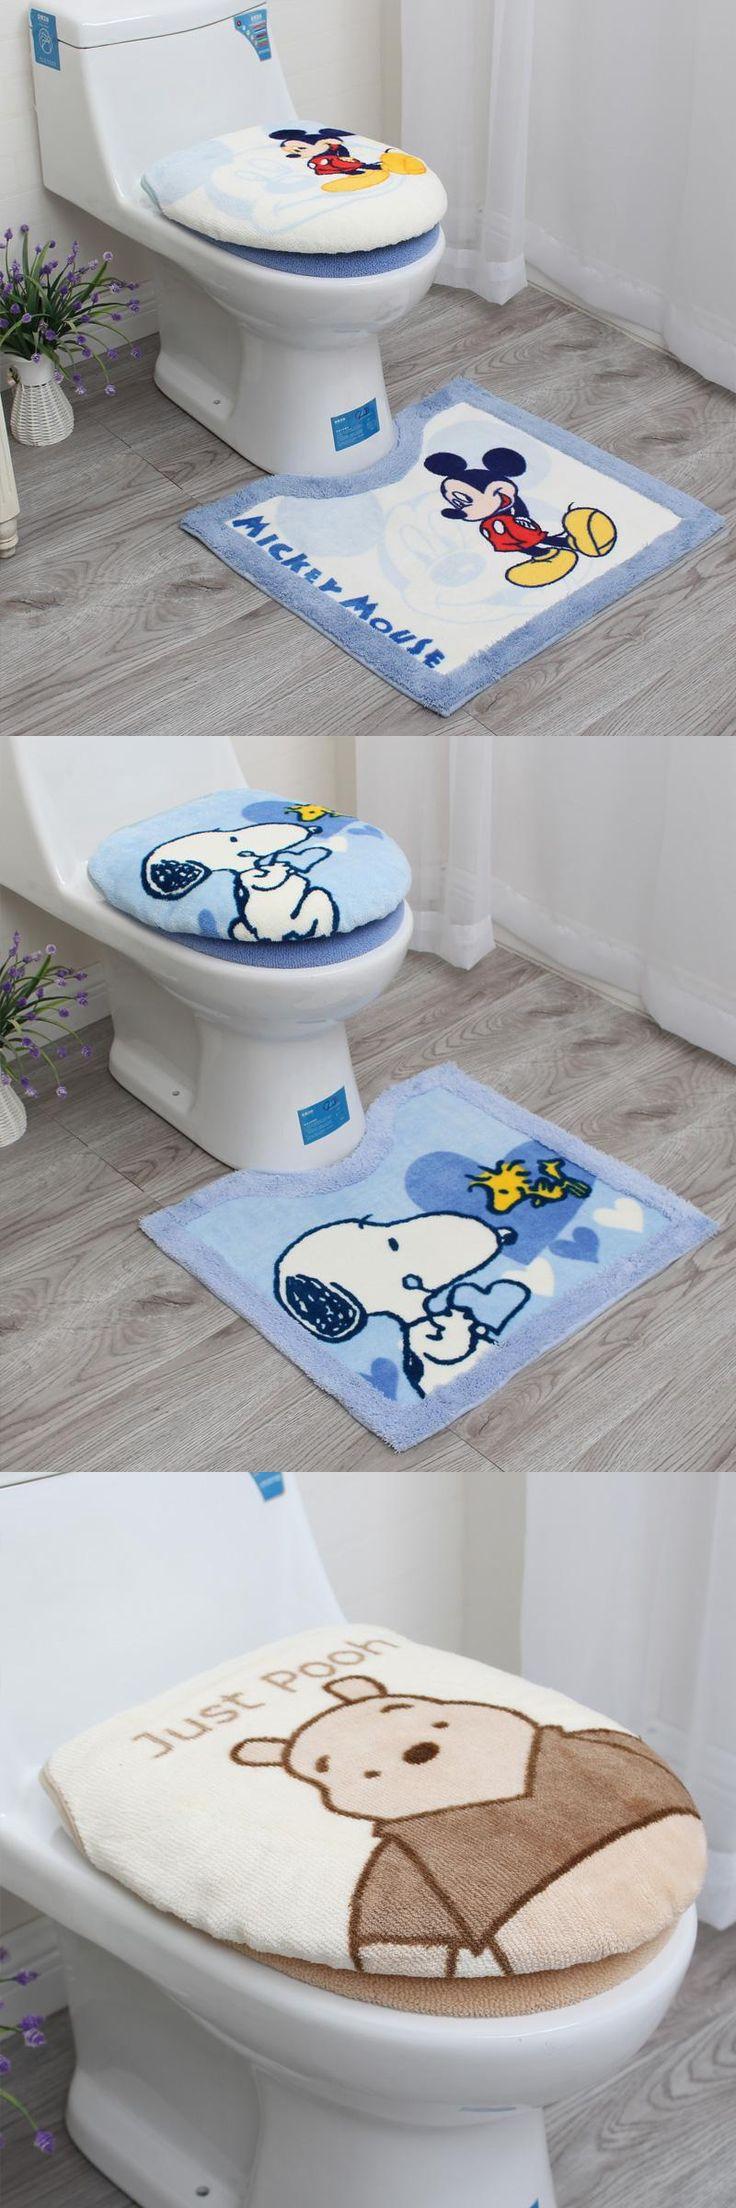 [Visit to Buy] 3Pcs/Set Cartoon Bathroom Toilet Set Cover Thickened Warm Plush Toilet Seat Cover Bath Mat Washable O Ring Toilet Seat Cushion #Advertisement